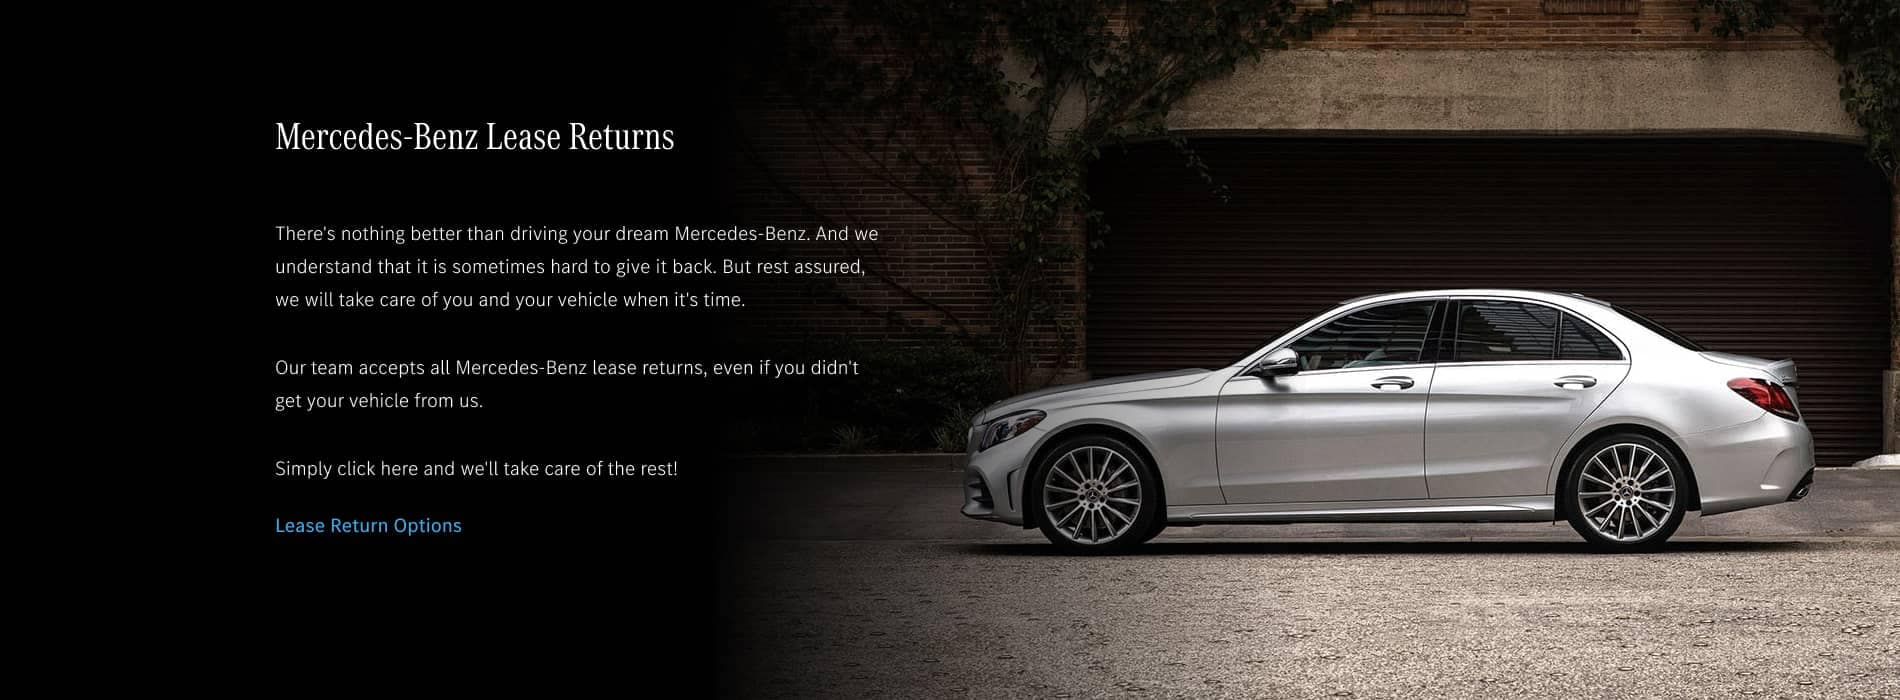 Mercedes-Benz Lease Returns Desktop